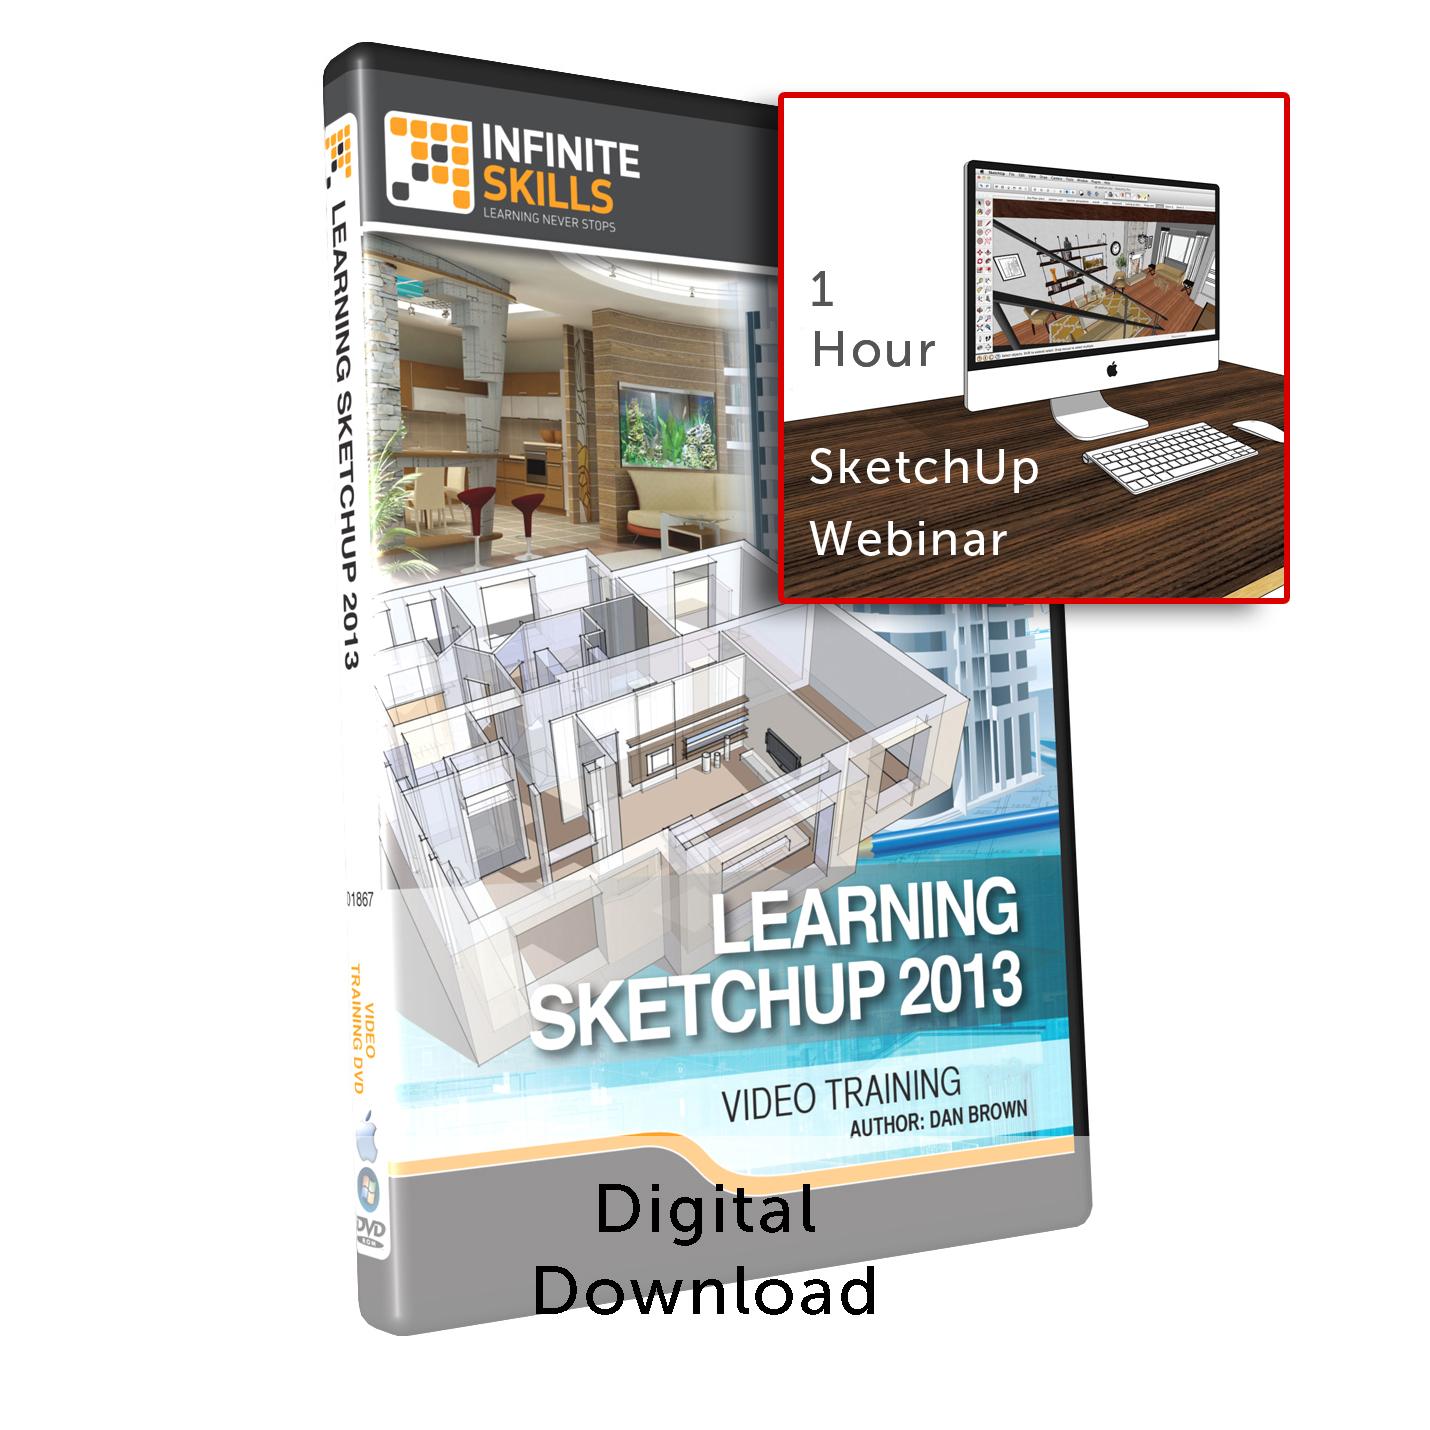 Db learning sketchup 2015 1 hr webinar training for Sketchup 2013